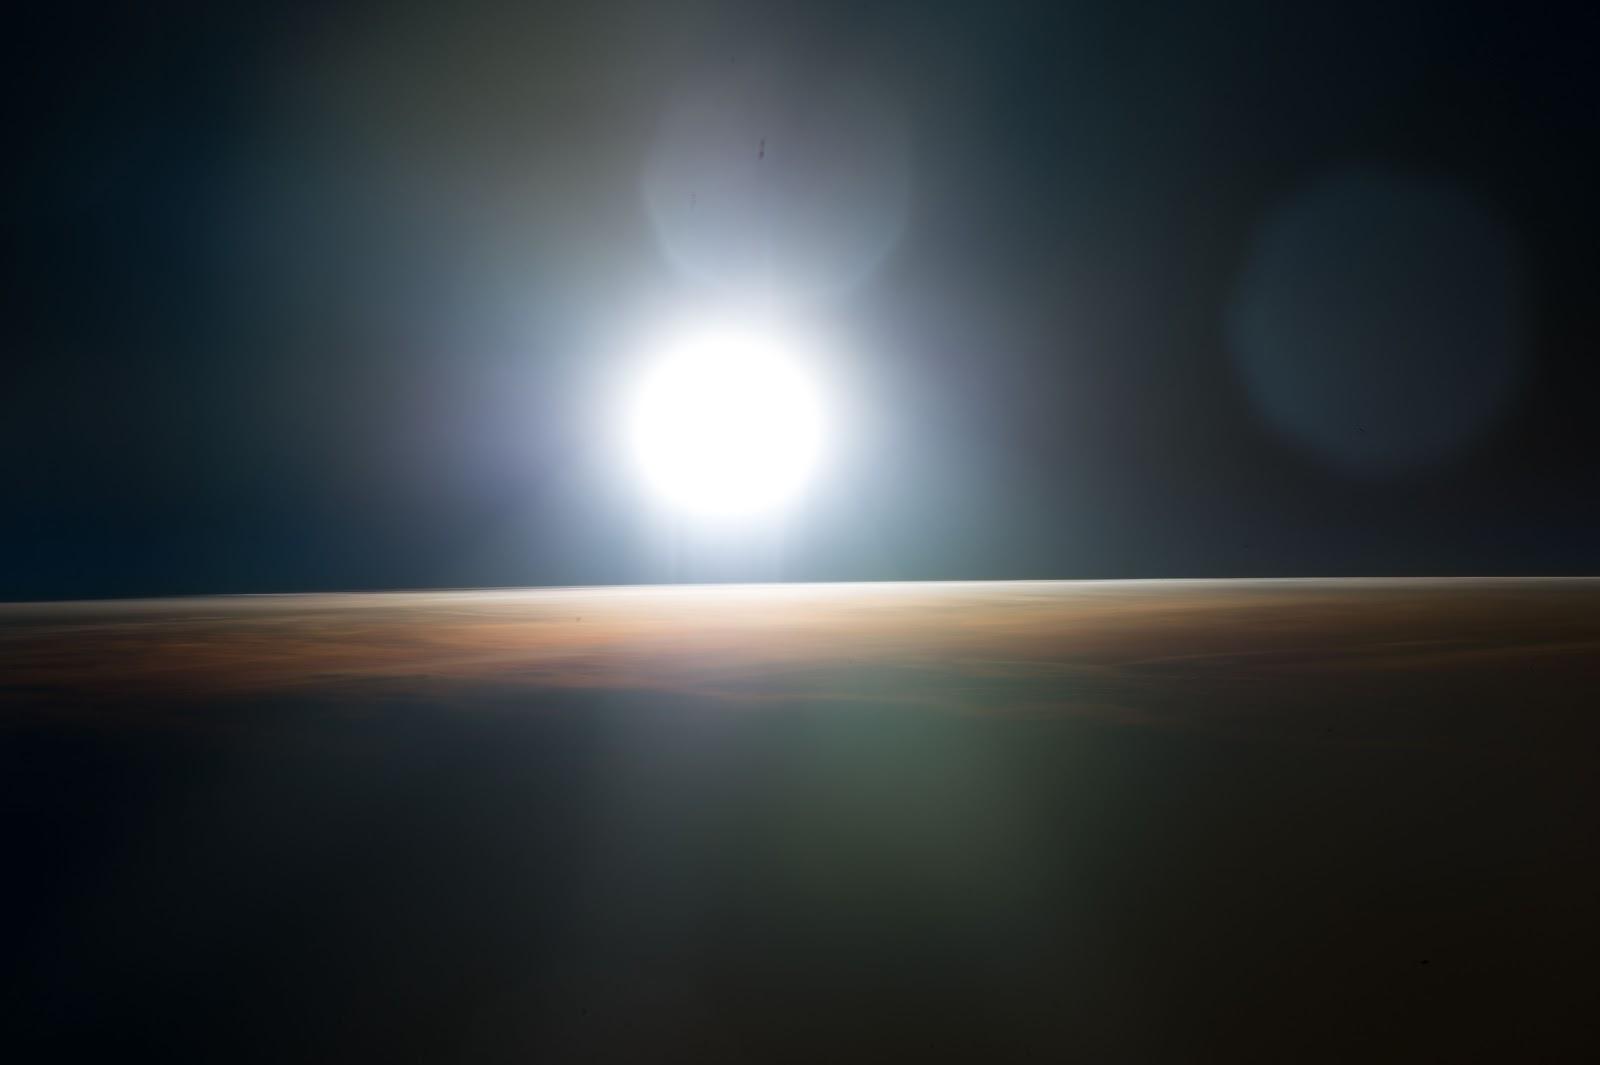 sunrise from international space station - photo #23